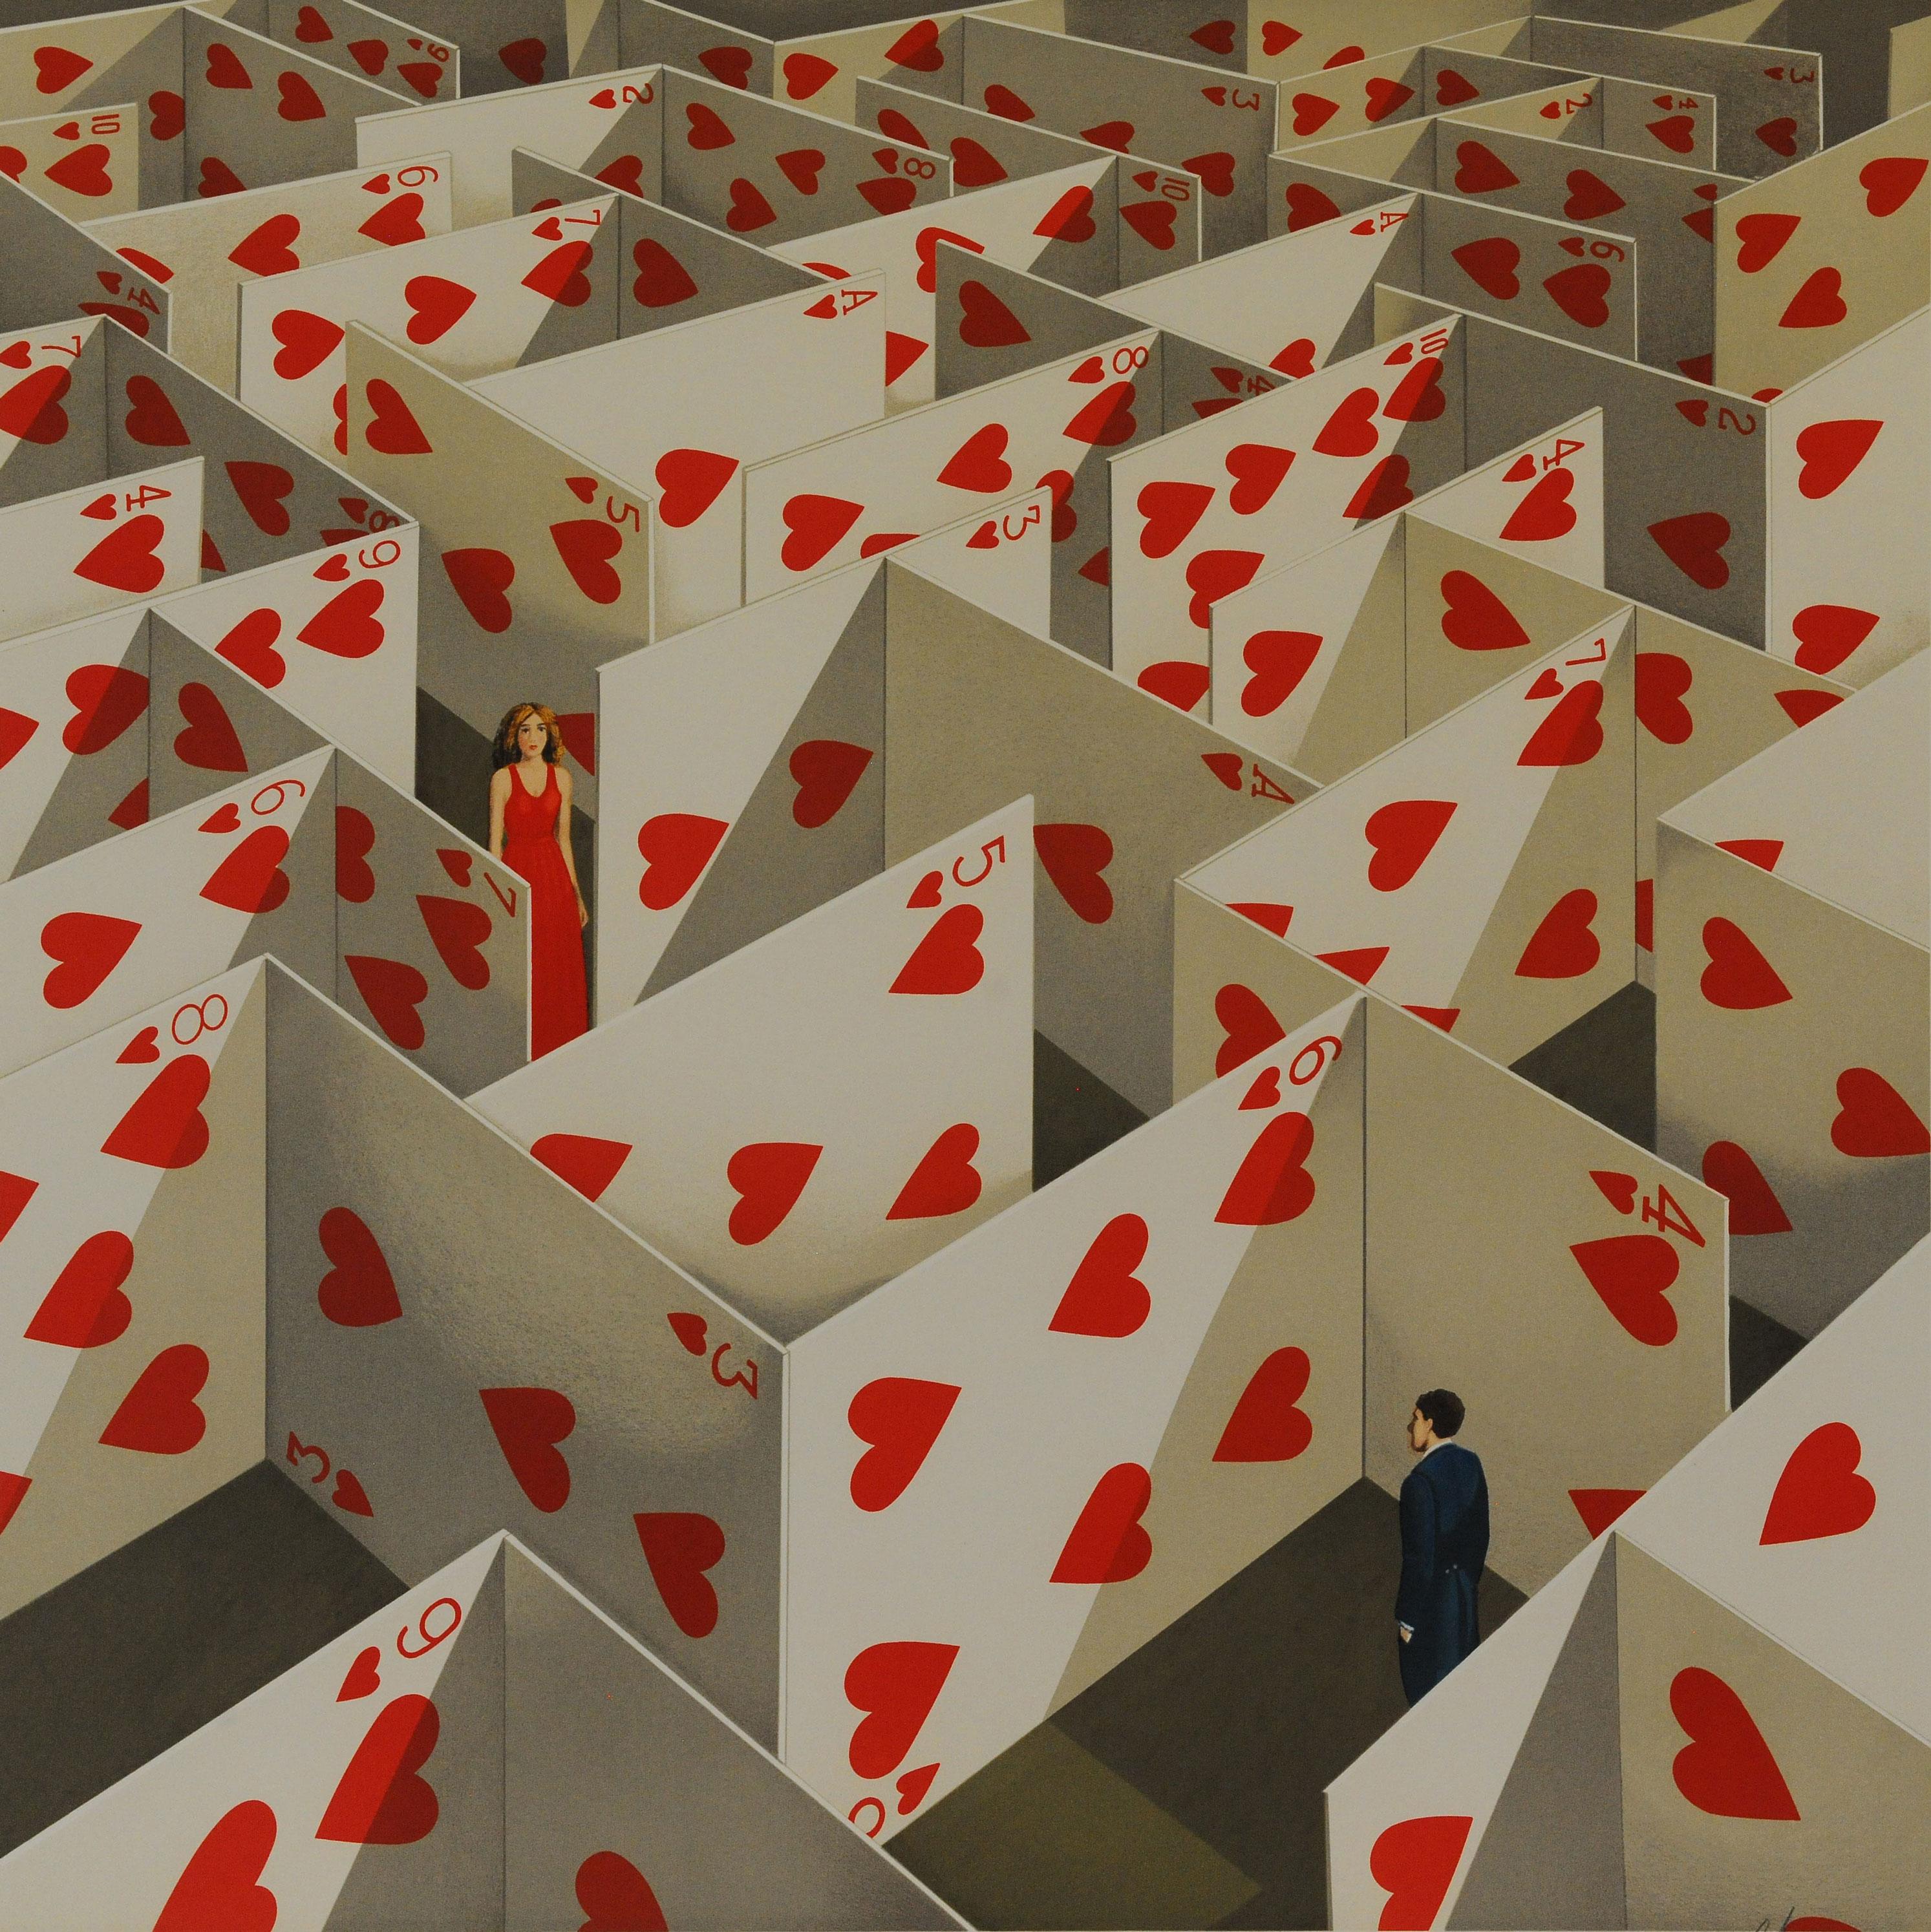 Rafal Olbinski Polish Poster surrealist surrealism dreamscape cards red hearts maze